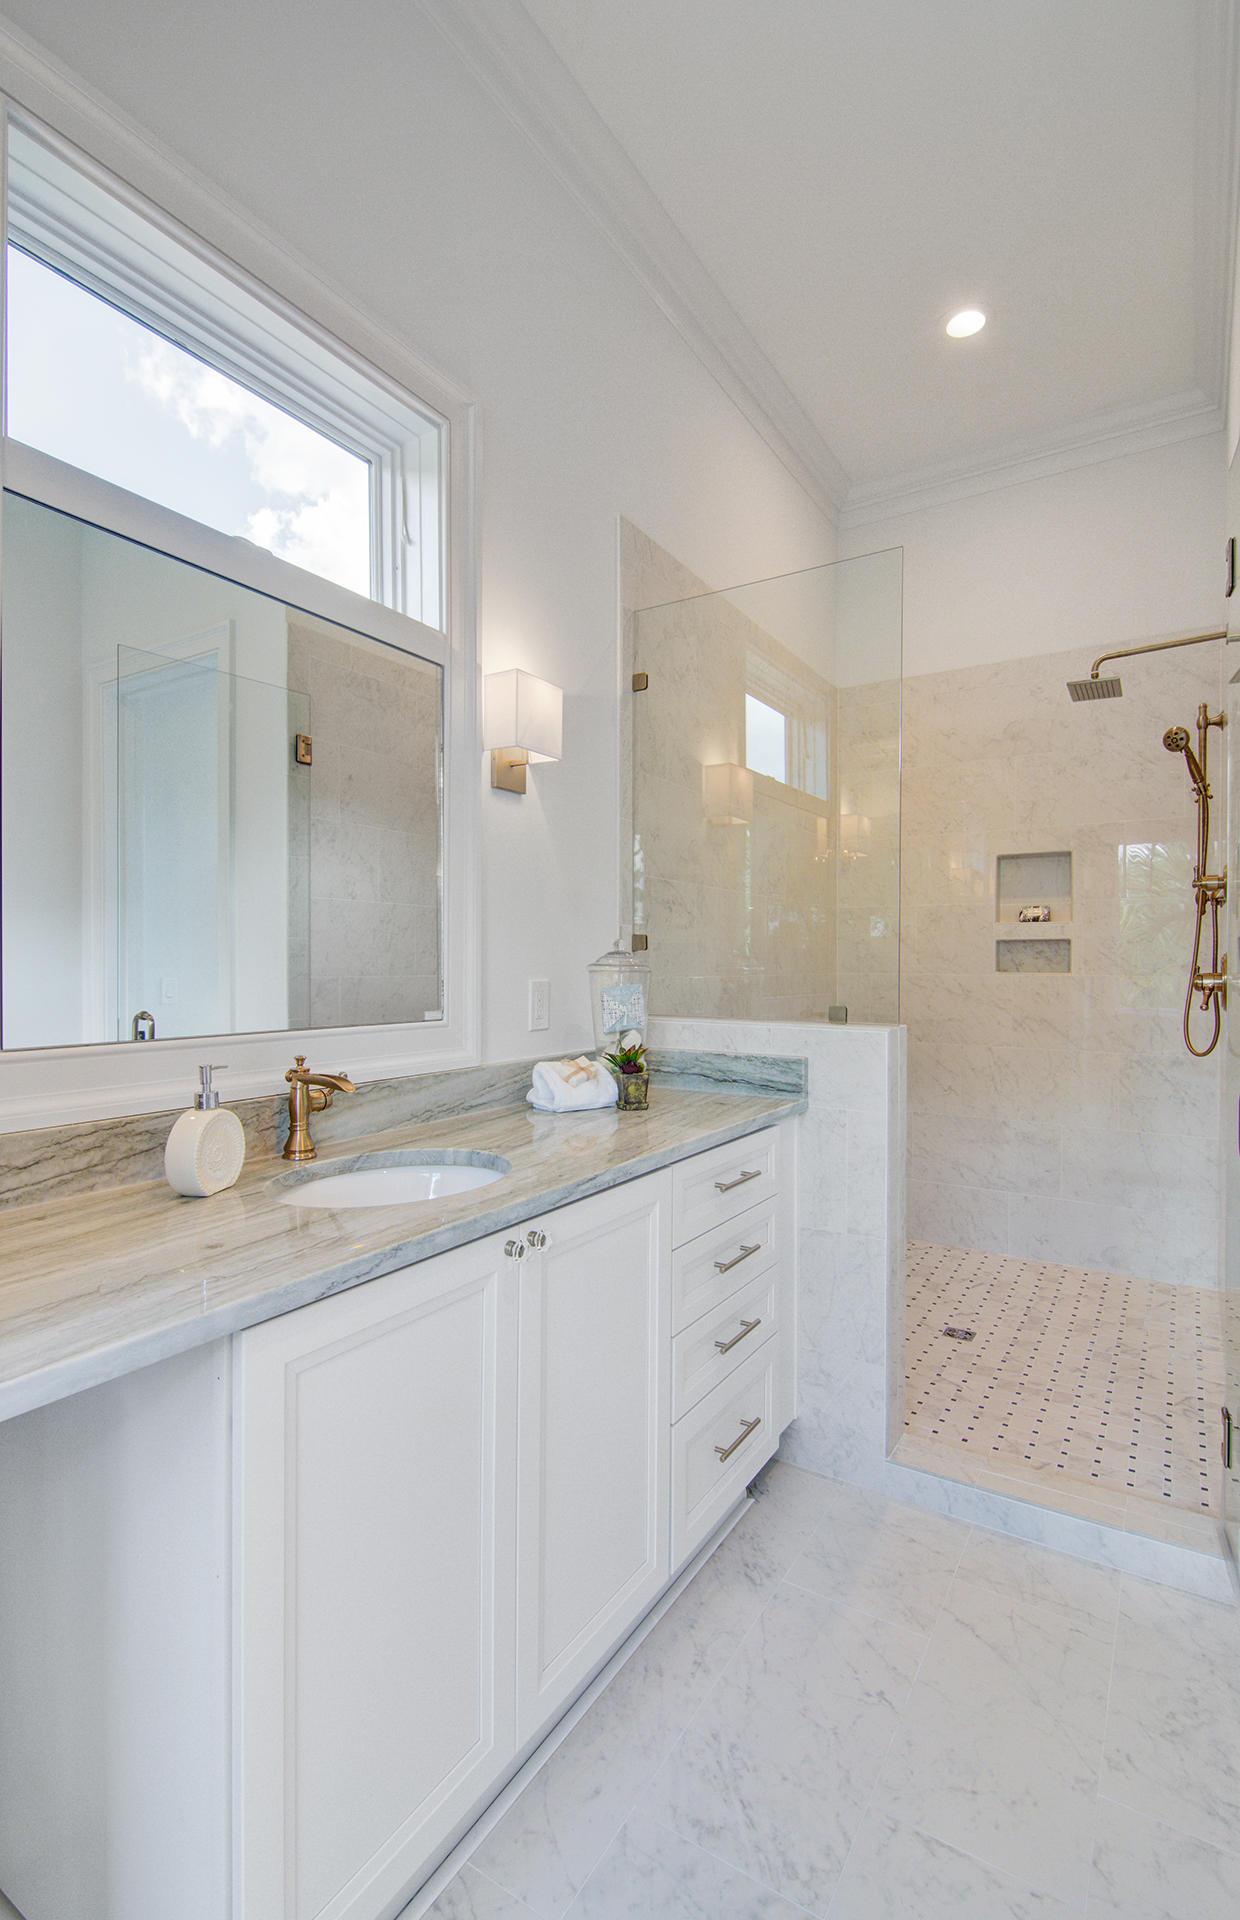 Briars Creek Homes For Sale - 3783 Gnarled Oaks, Johns Island, SC - 26